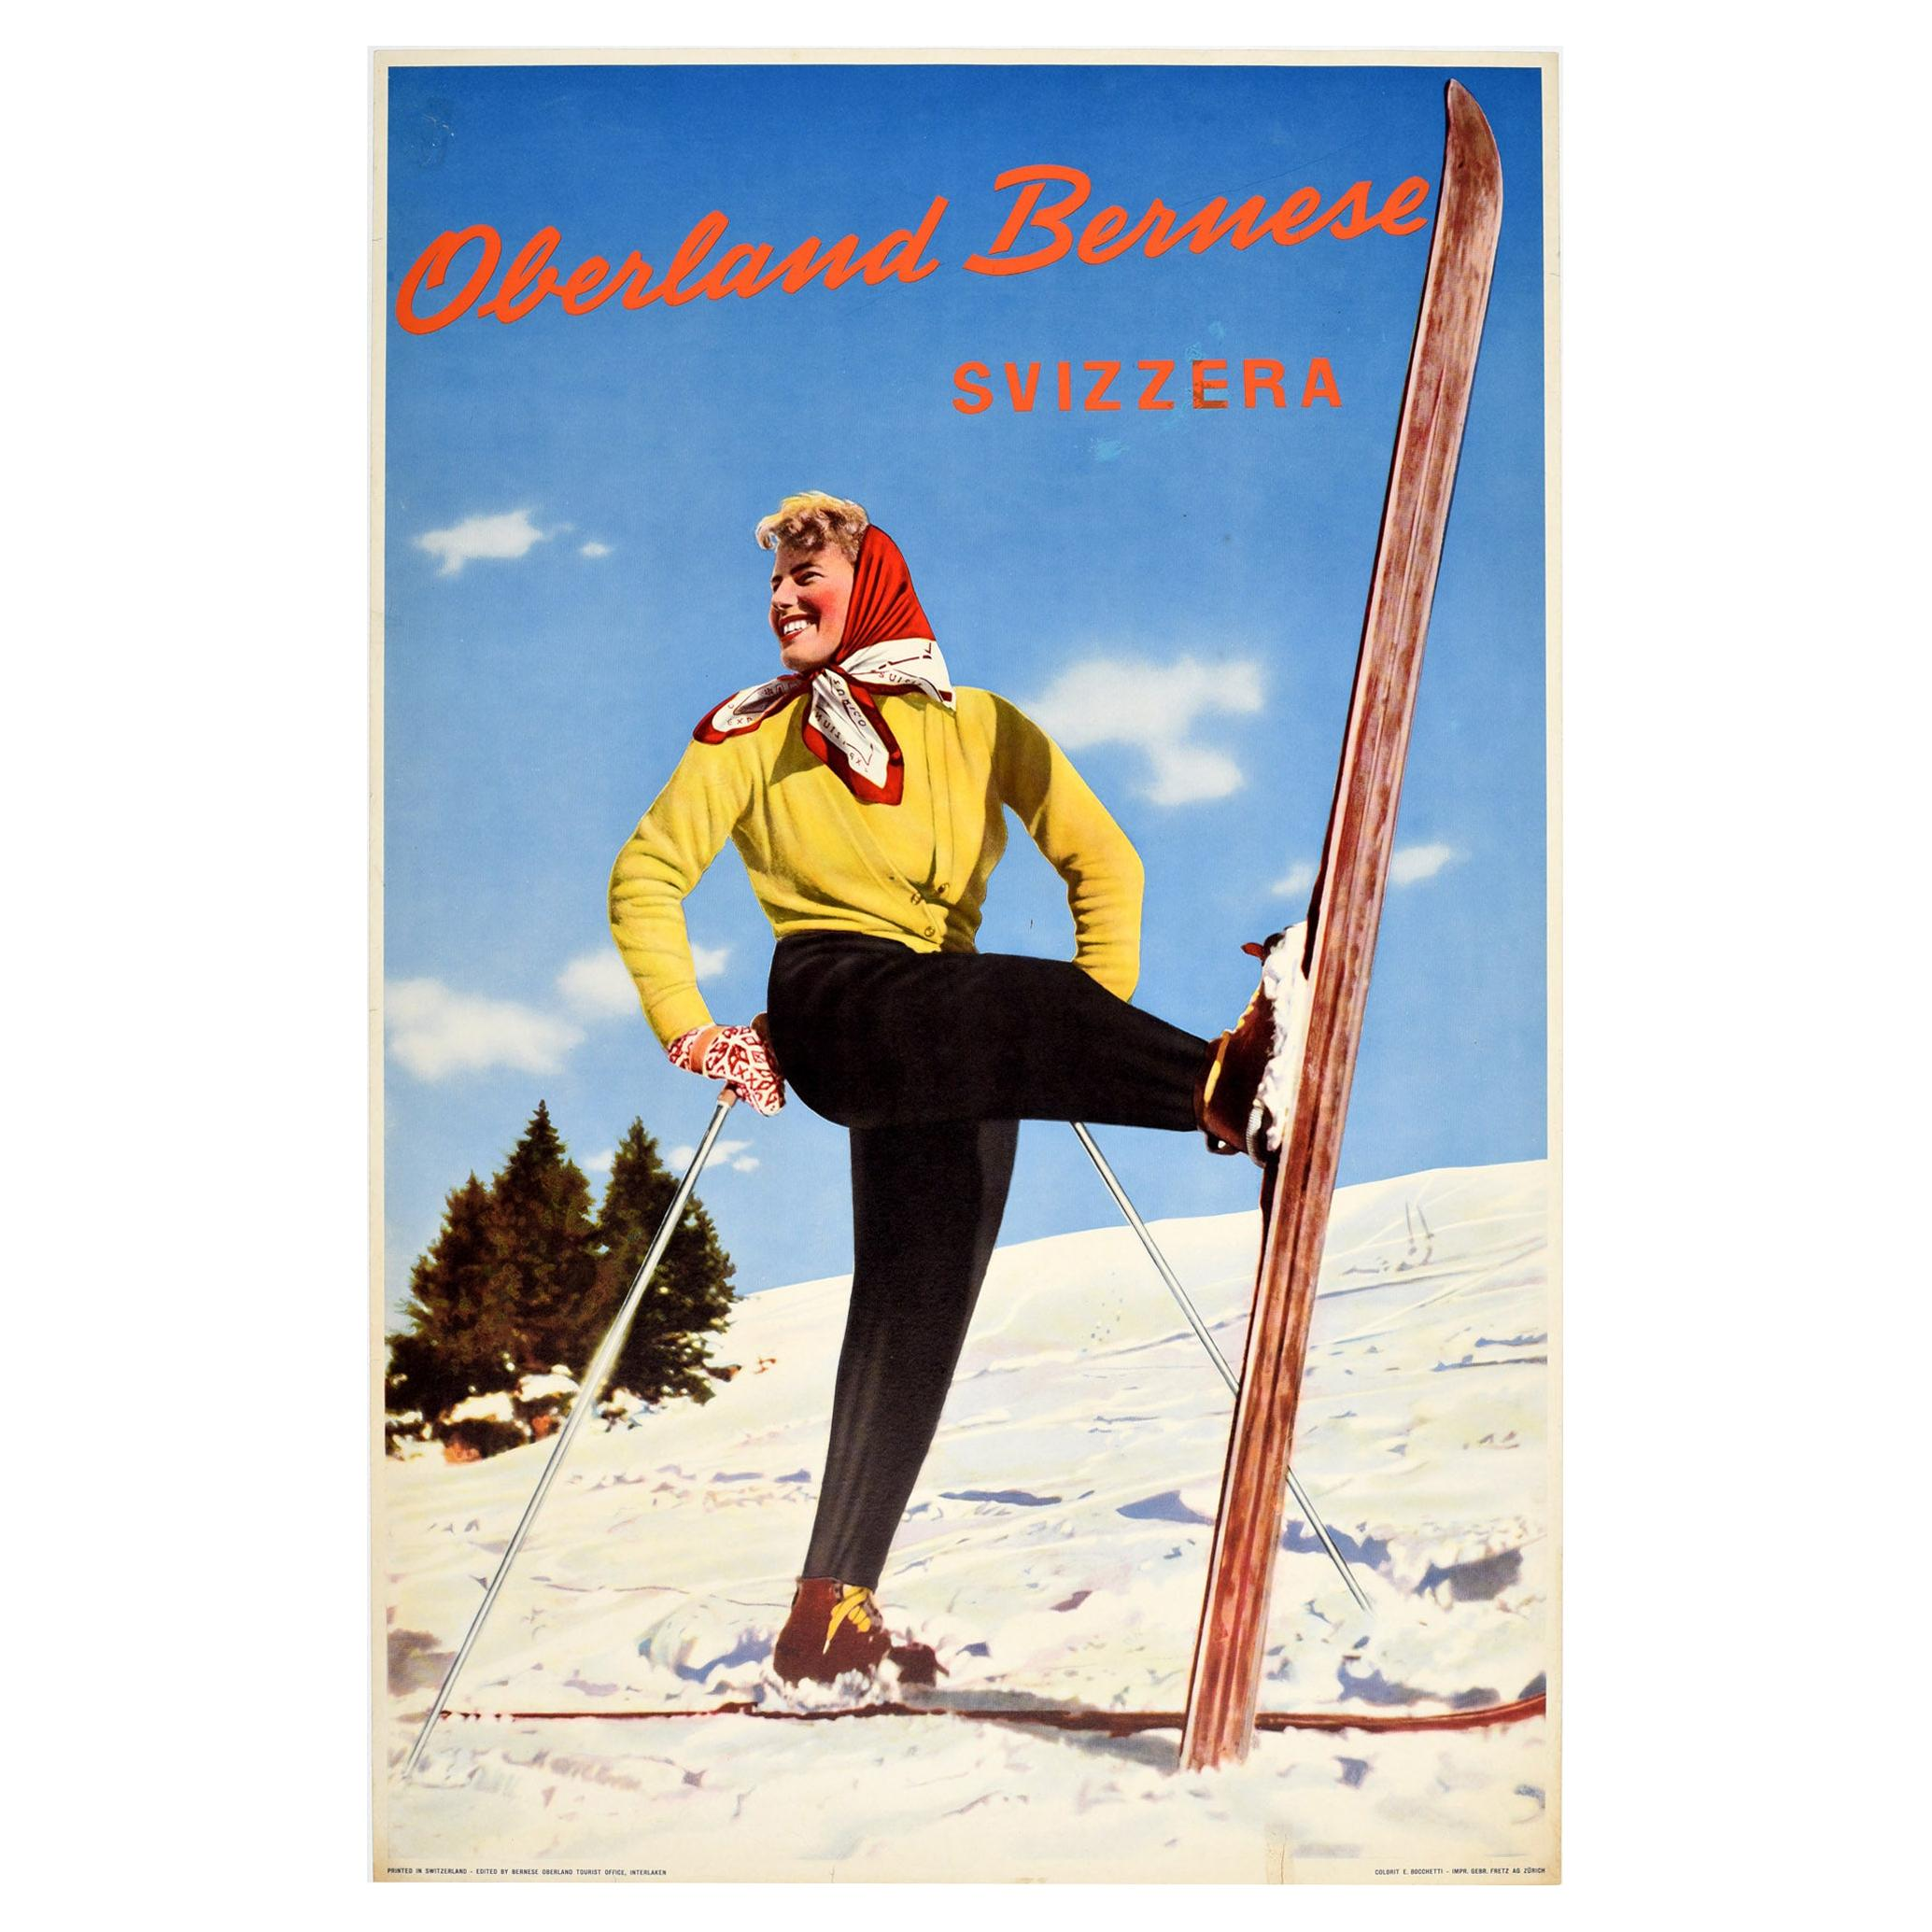 Original Vintage Poster Oberland Bernese Switzerland Winter Sport Skiing Travel